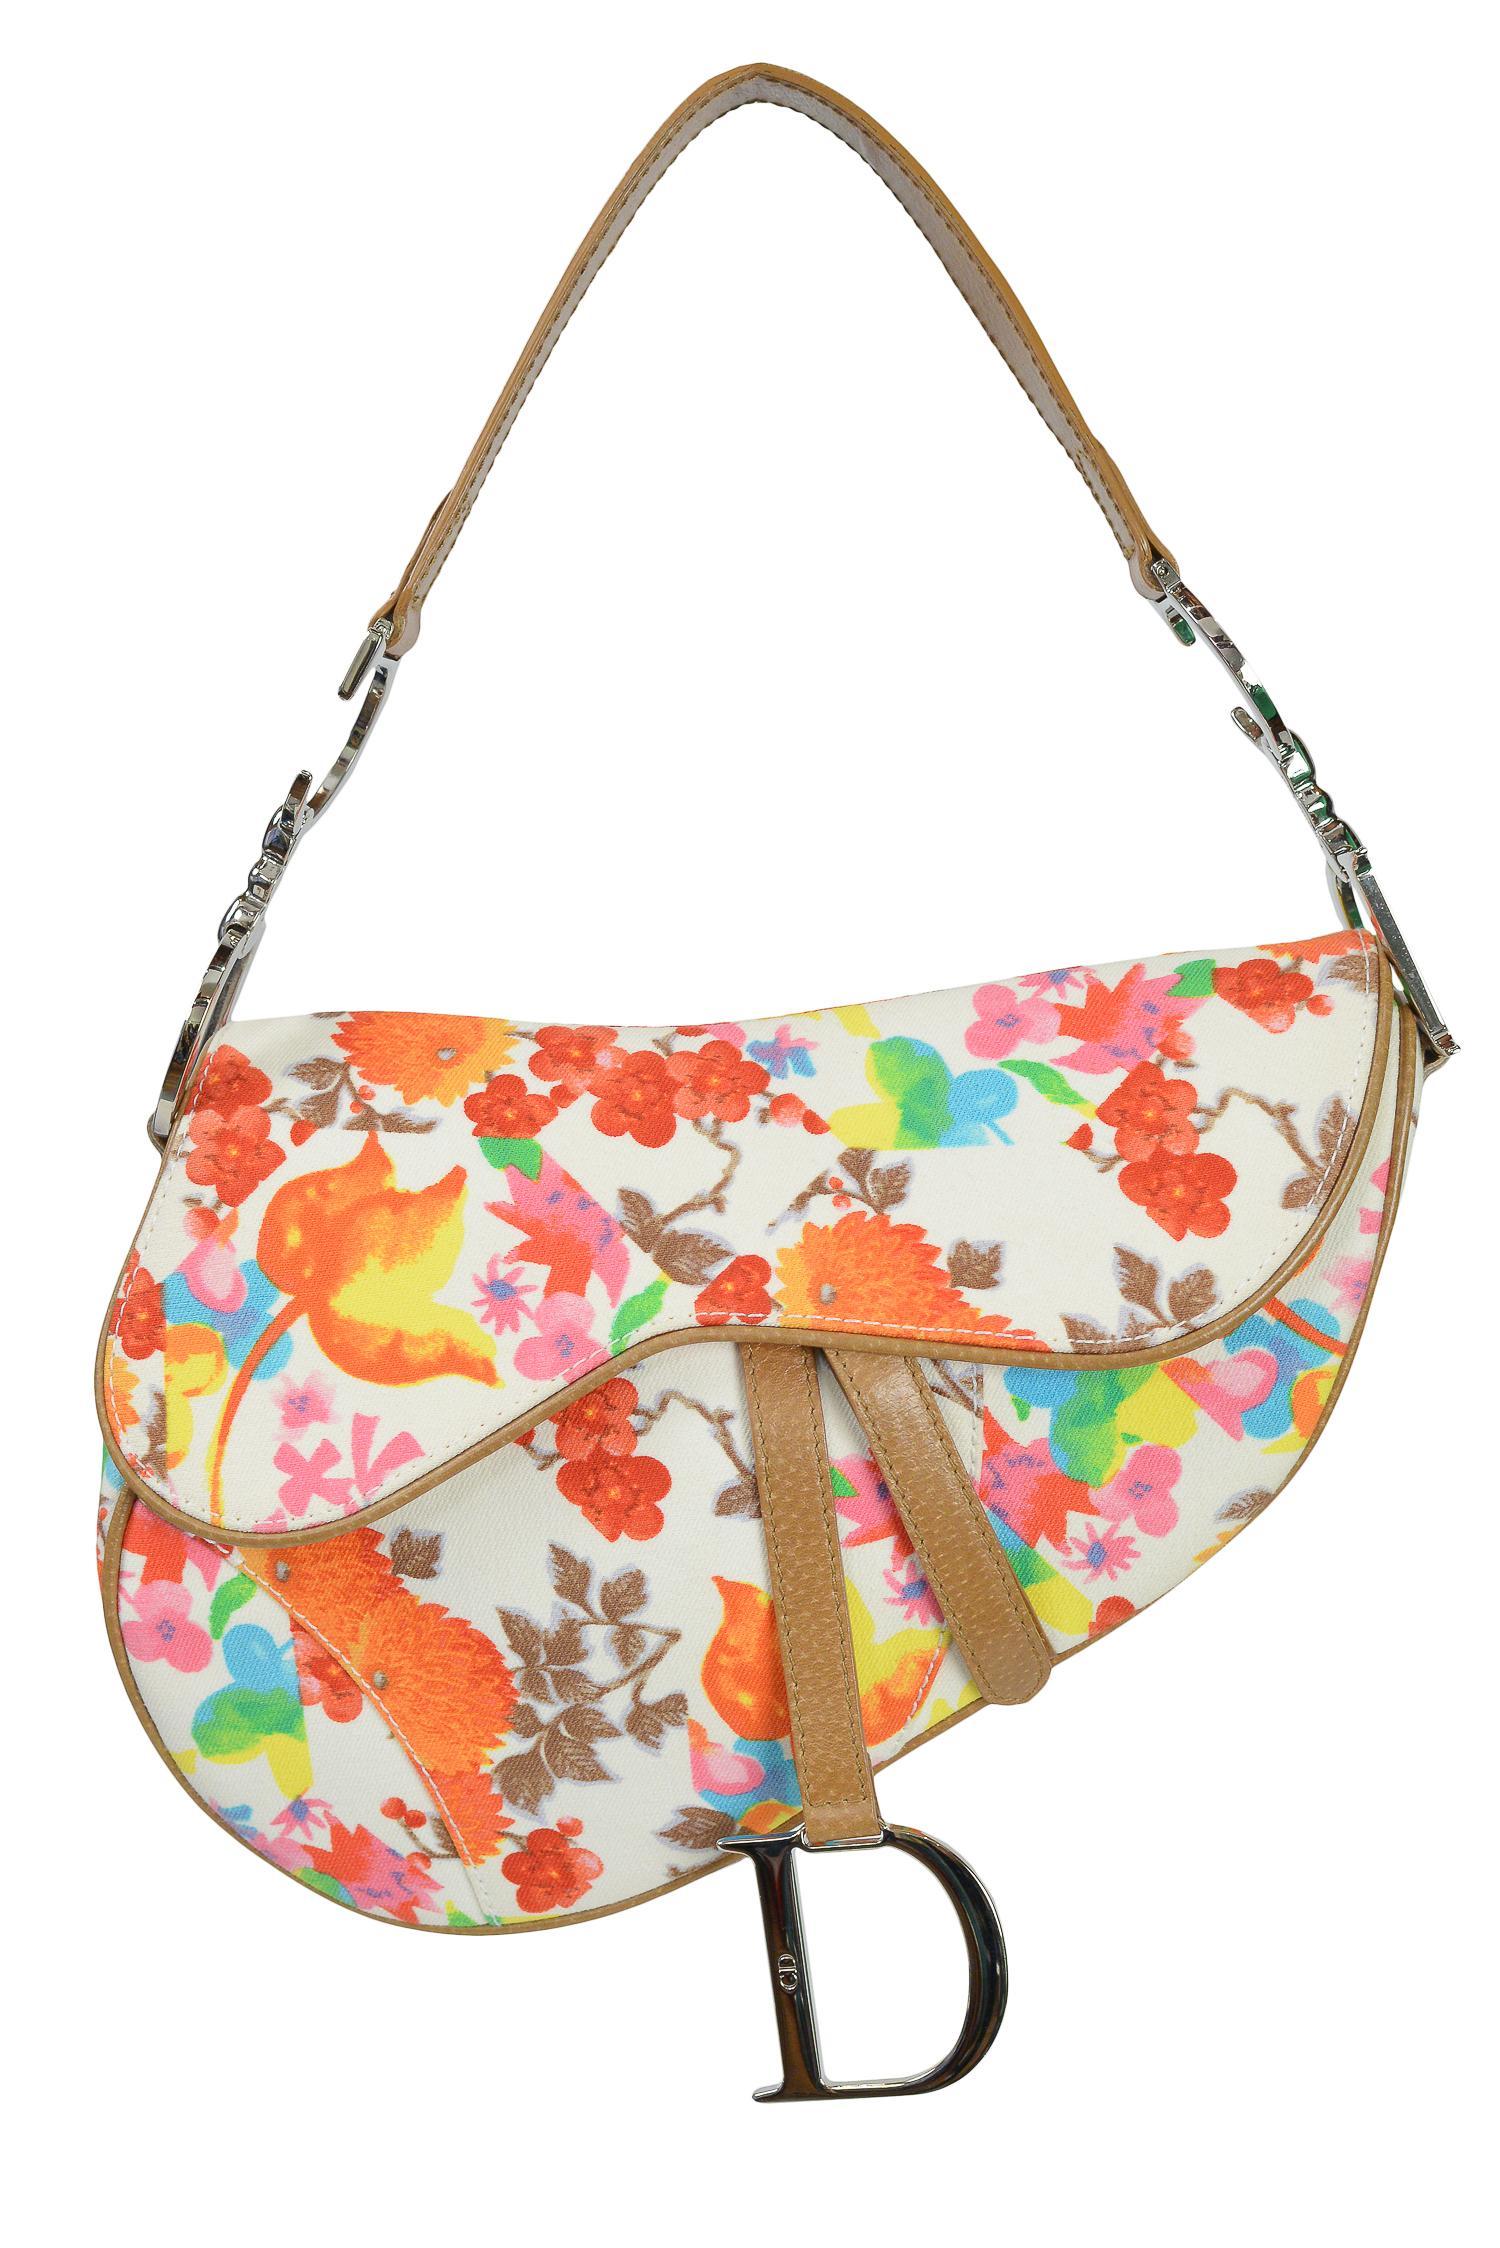 eddccd90b47 Vintage John Galliano for Christian Dior Floral Saddle Bag For Sale at  1stdibs